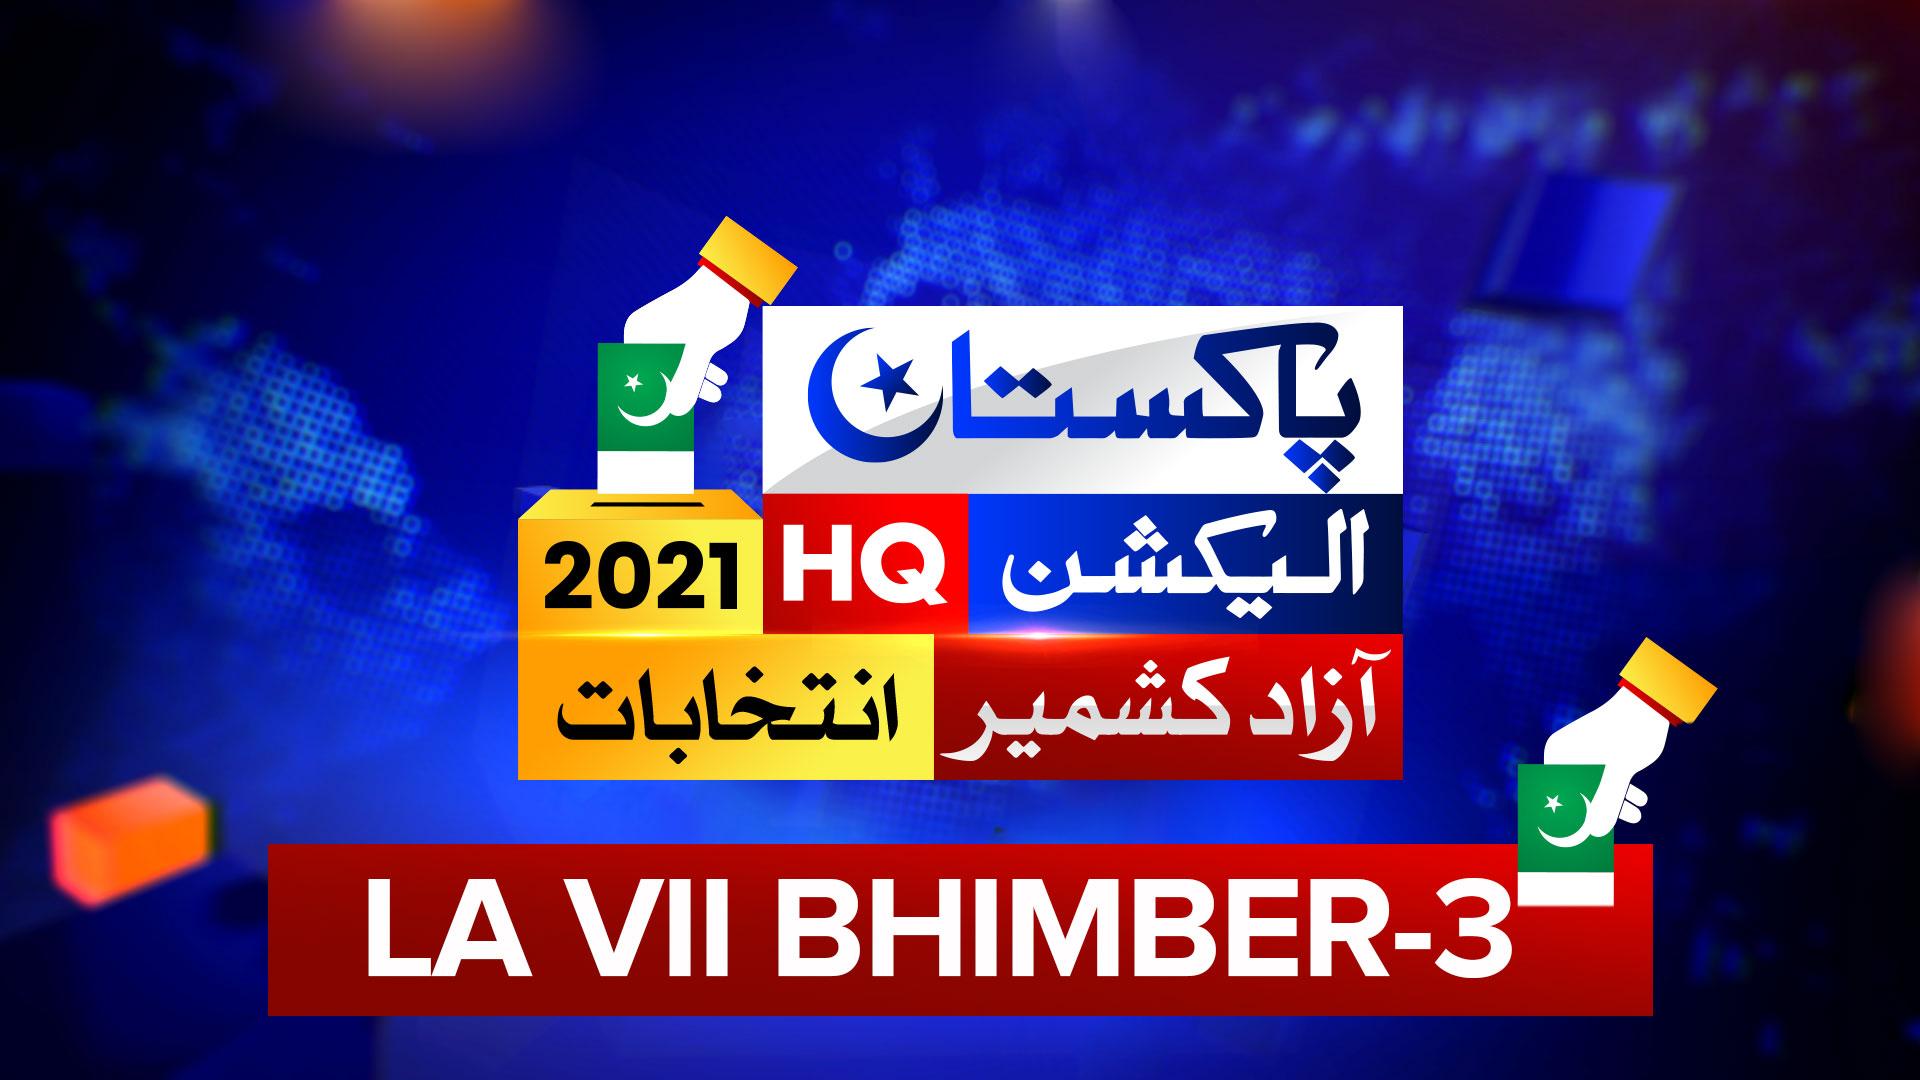 LA 7 BHIMBER 3 result 2021